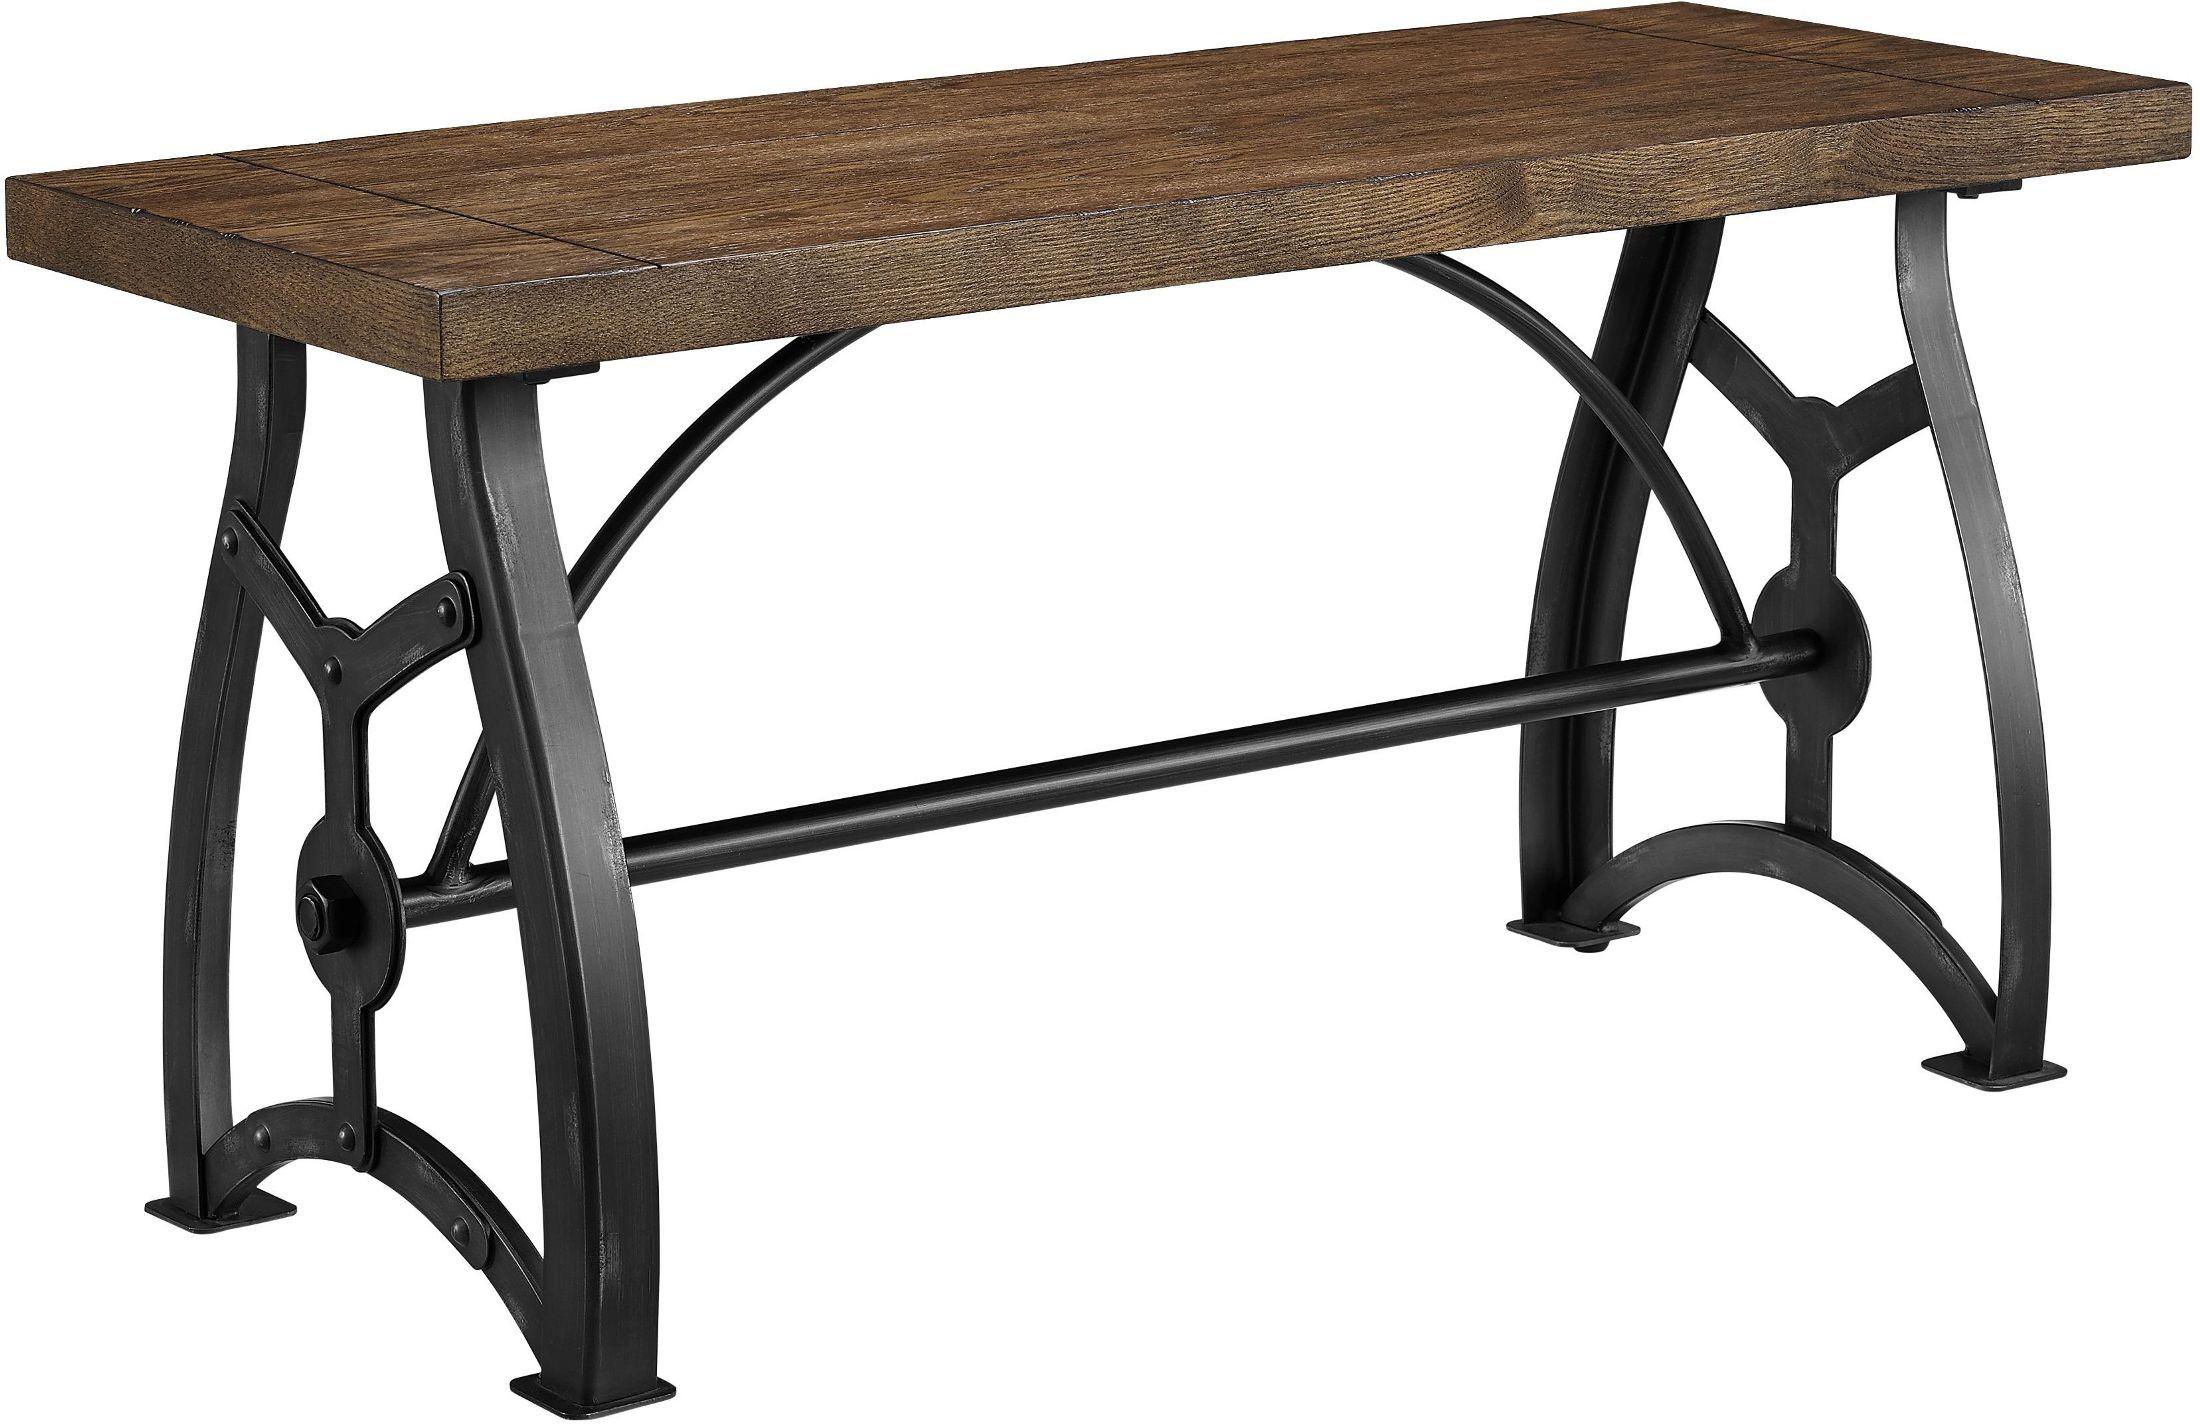 Rosebank Wood And Metal Dining Bench From Pulaski Coleman Furniture